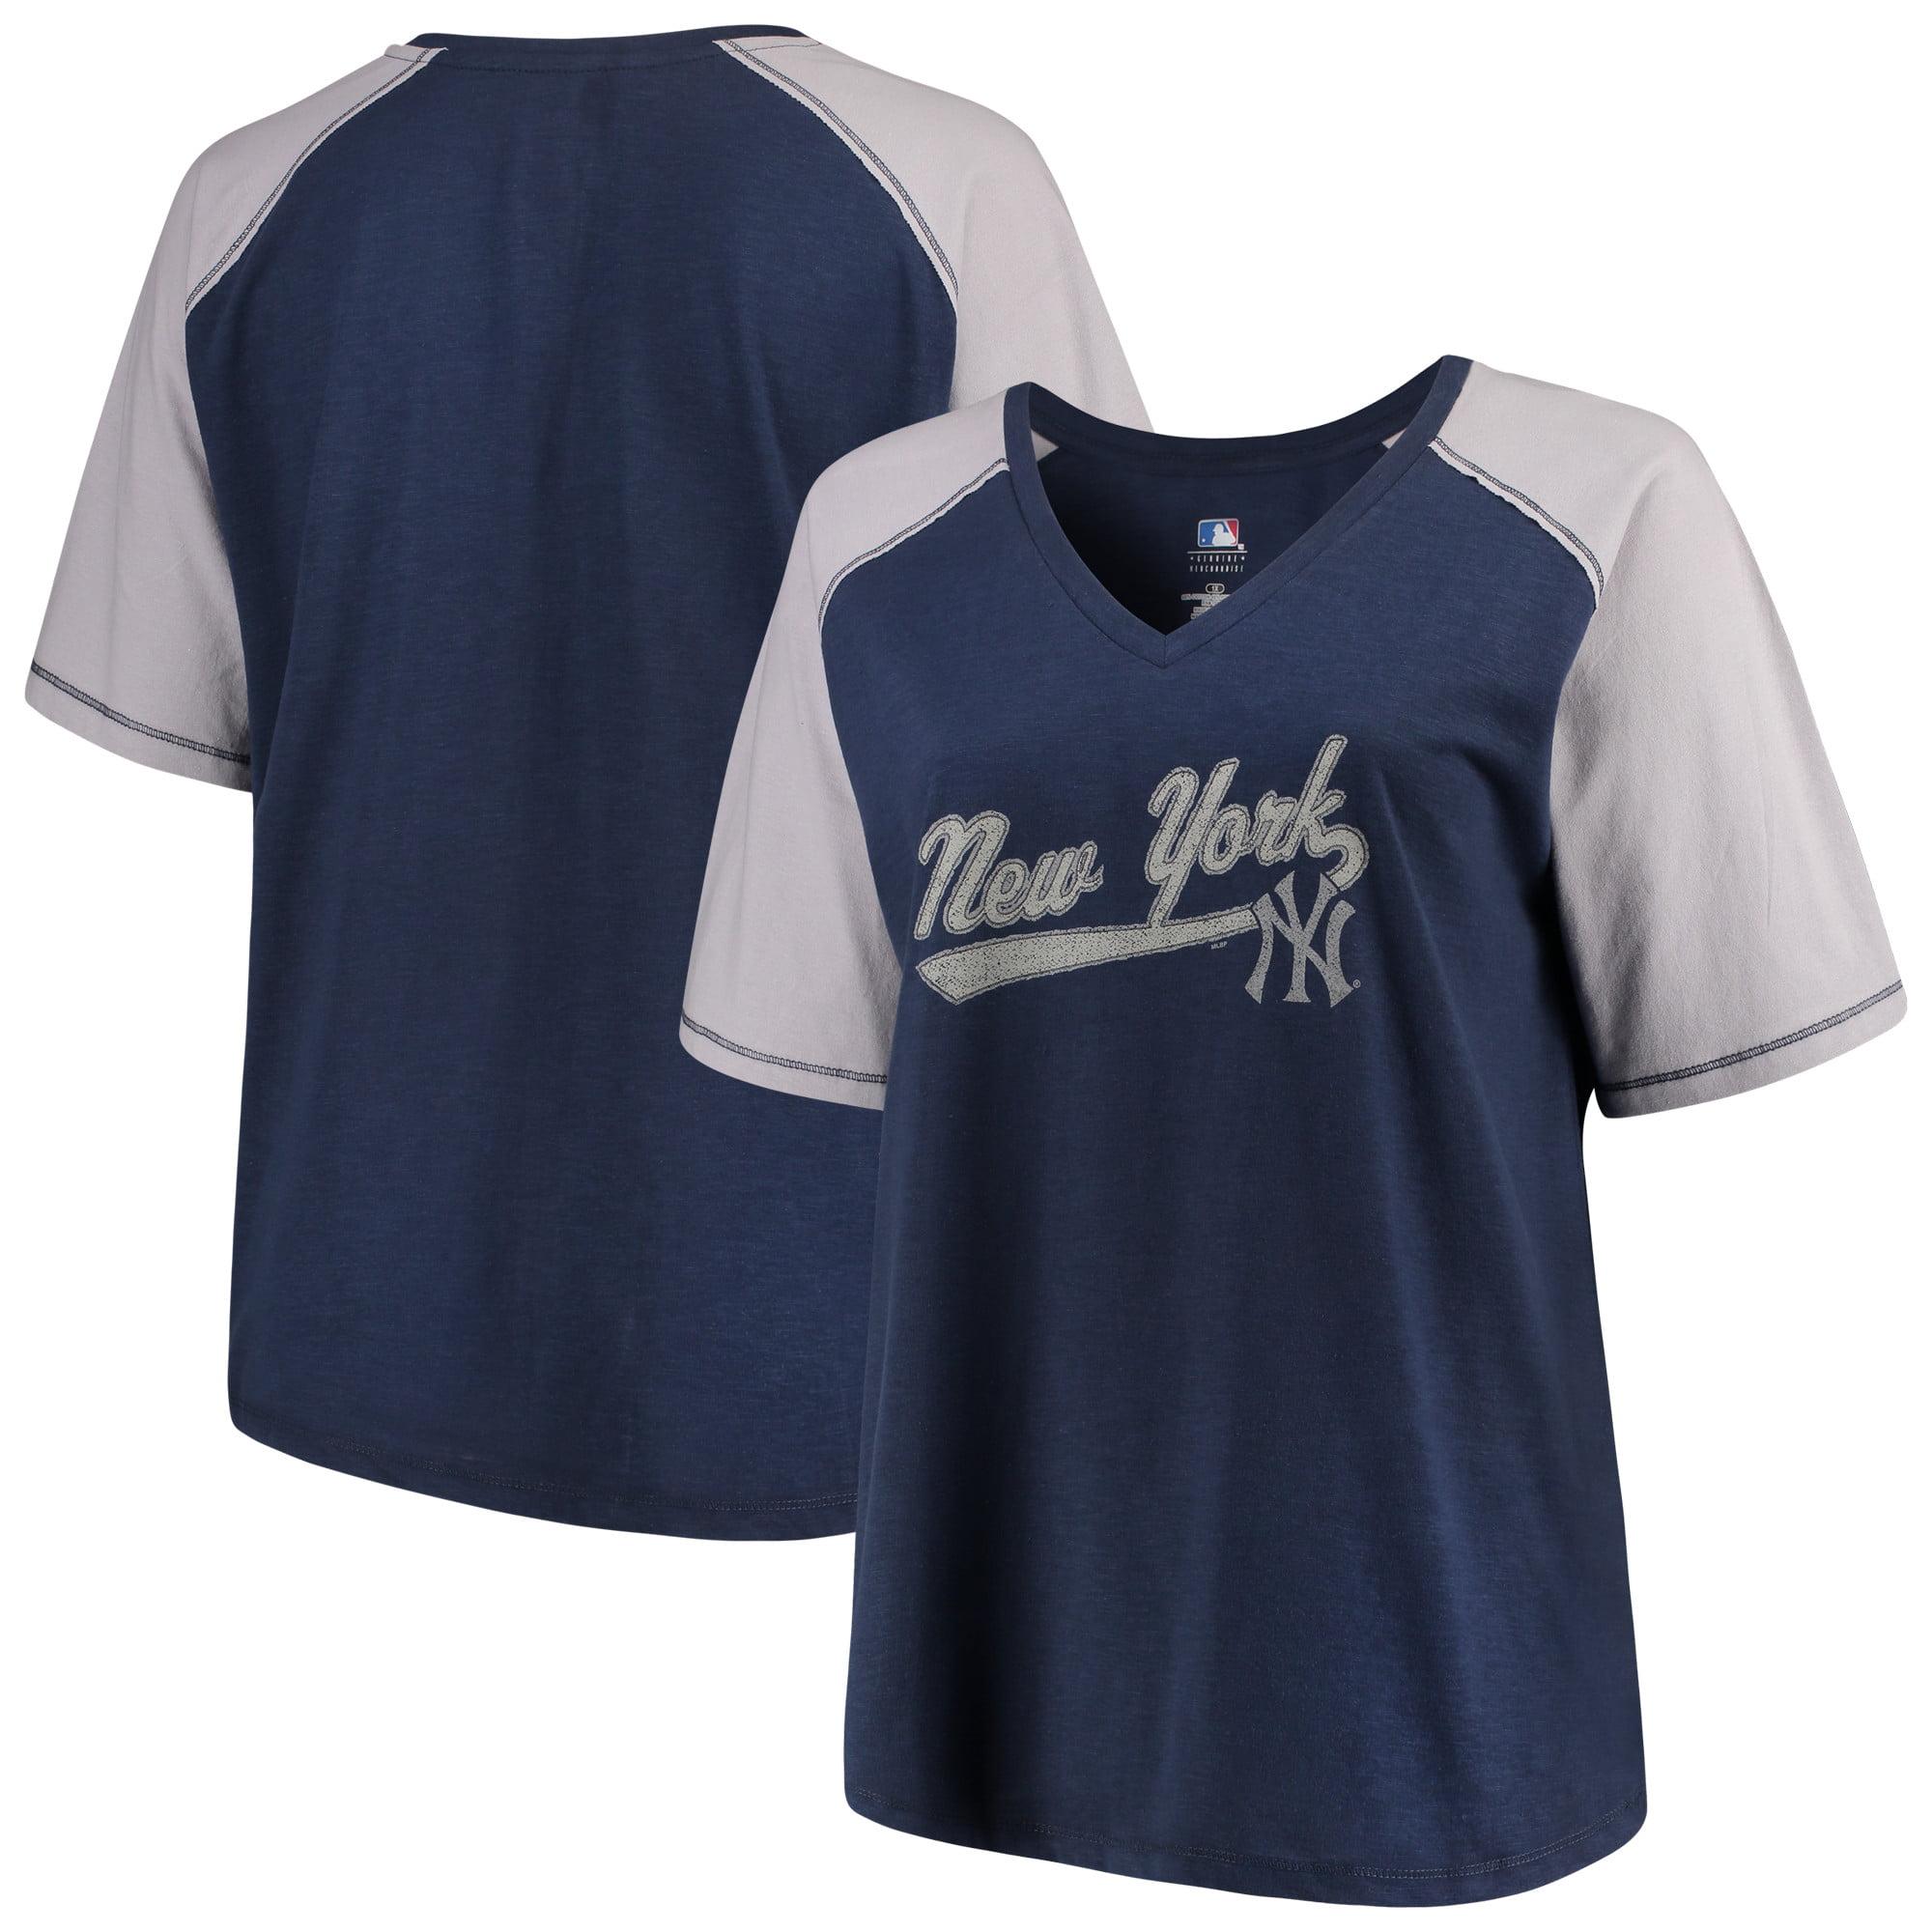 Women's Majestic Navy/Gray New York Yankees Plus Size High Percentage Raglan V-Neck T-Shirt